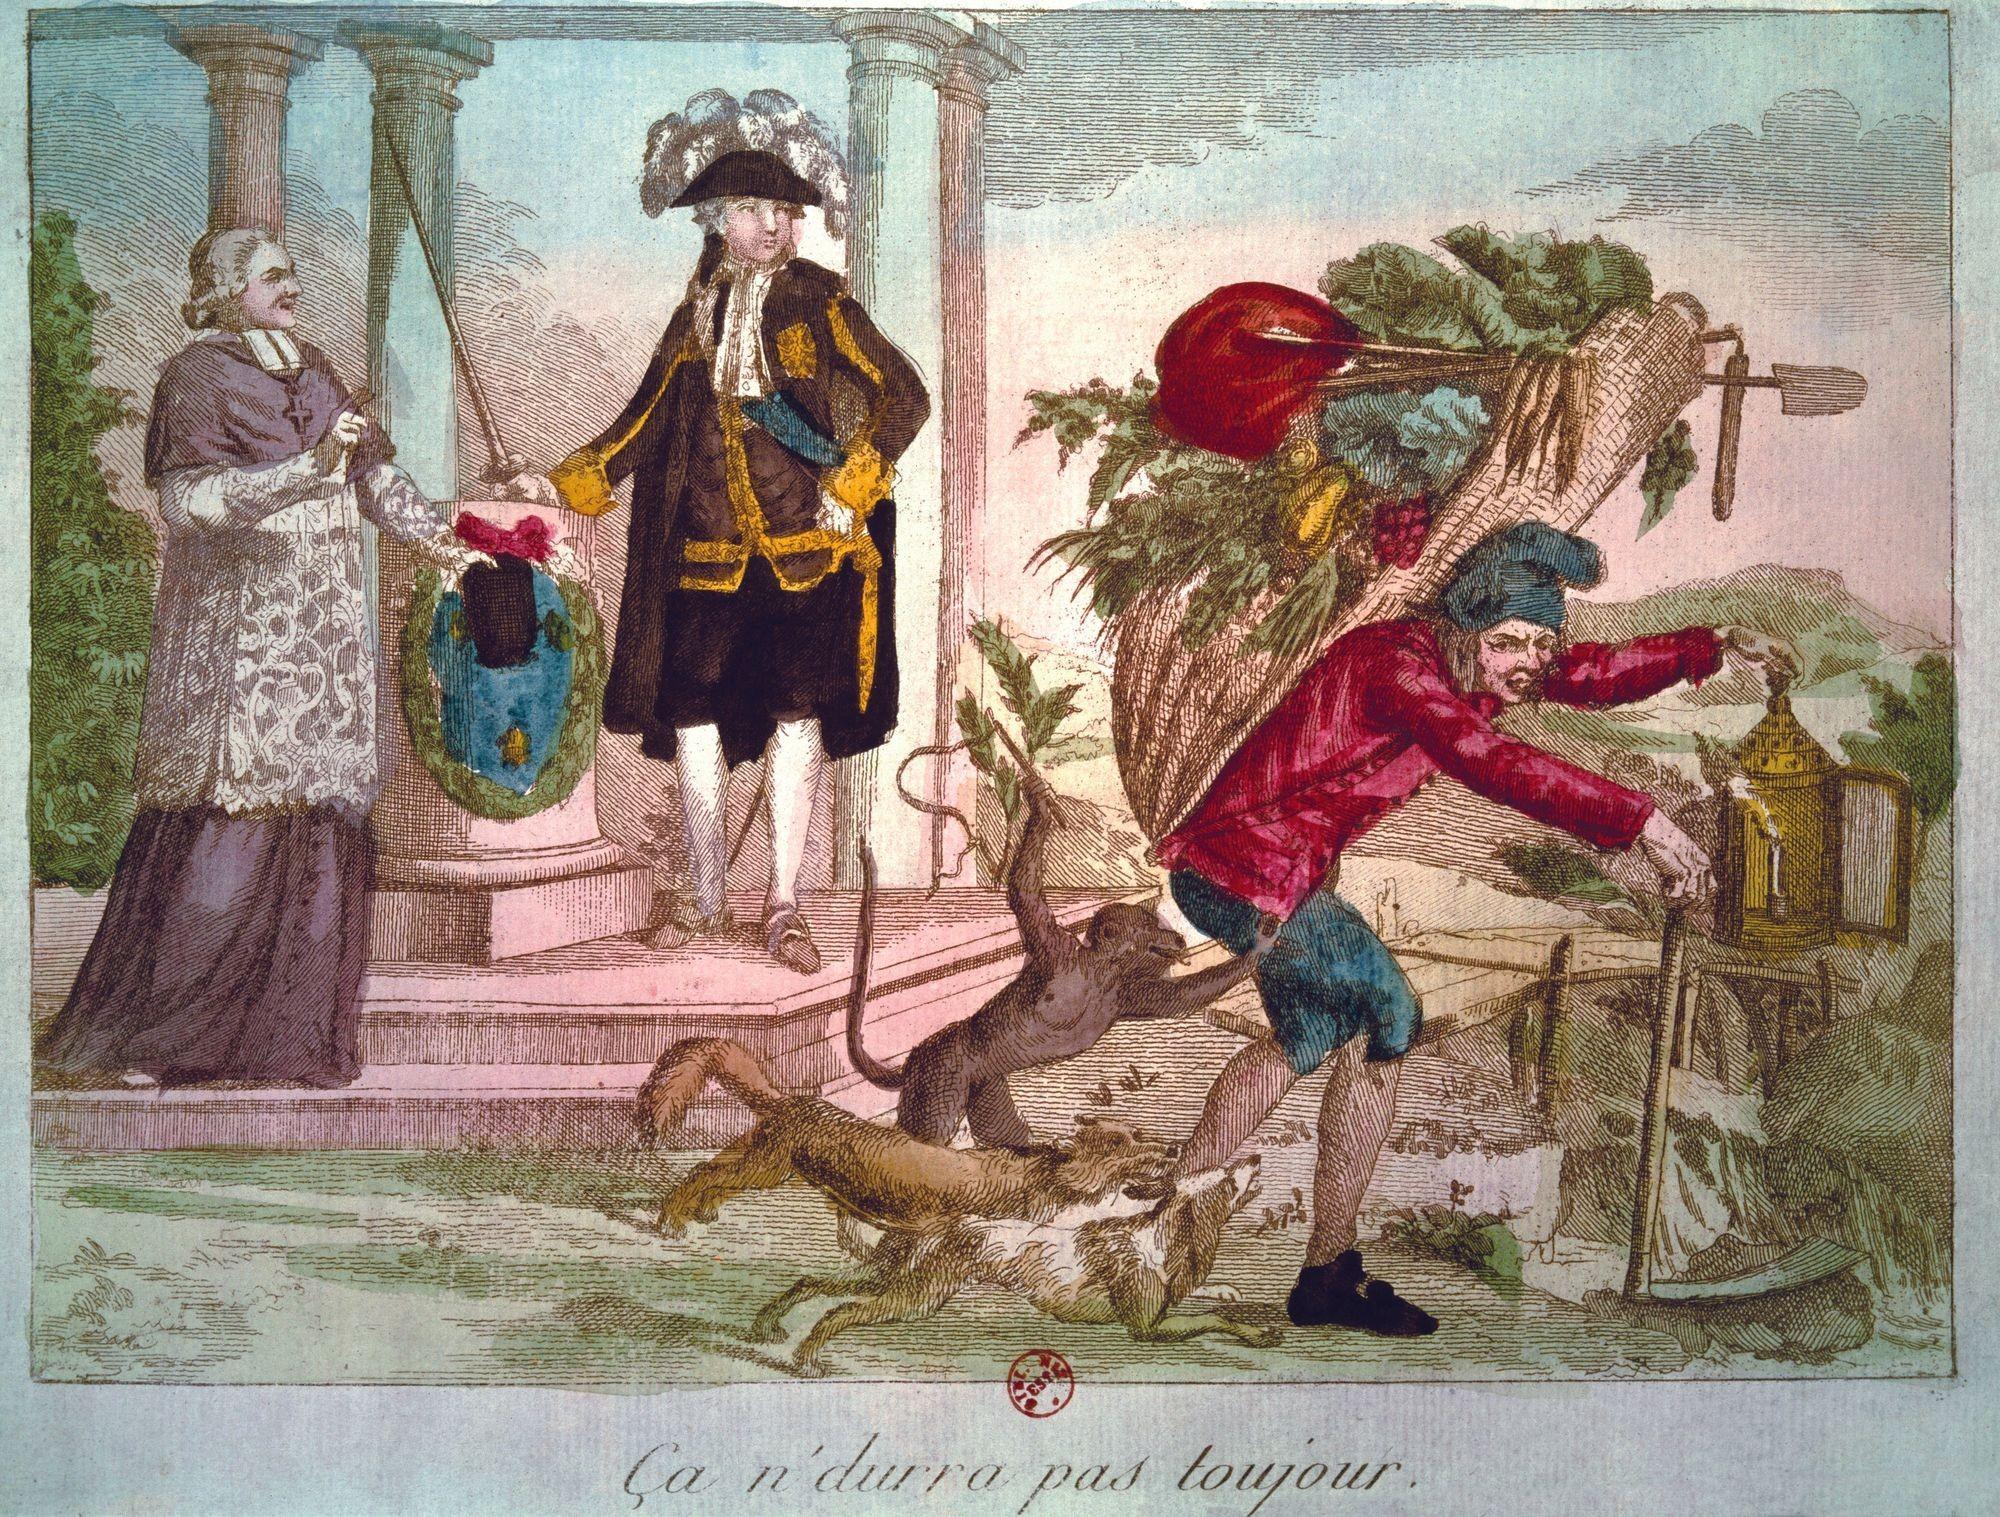 « Ca ne durera pas toujours ! », XVIIIe siècle, gravure